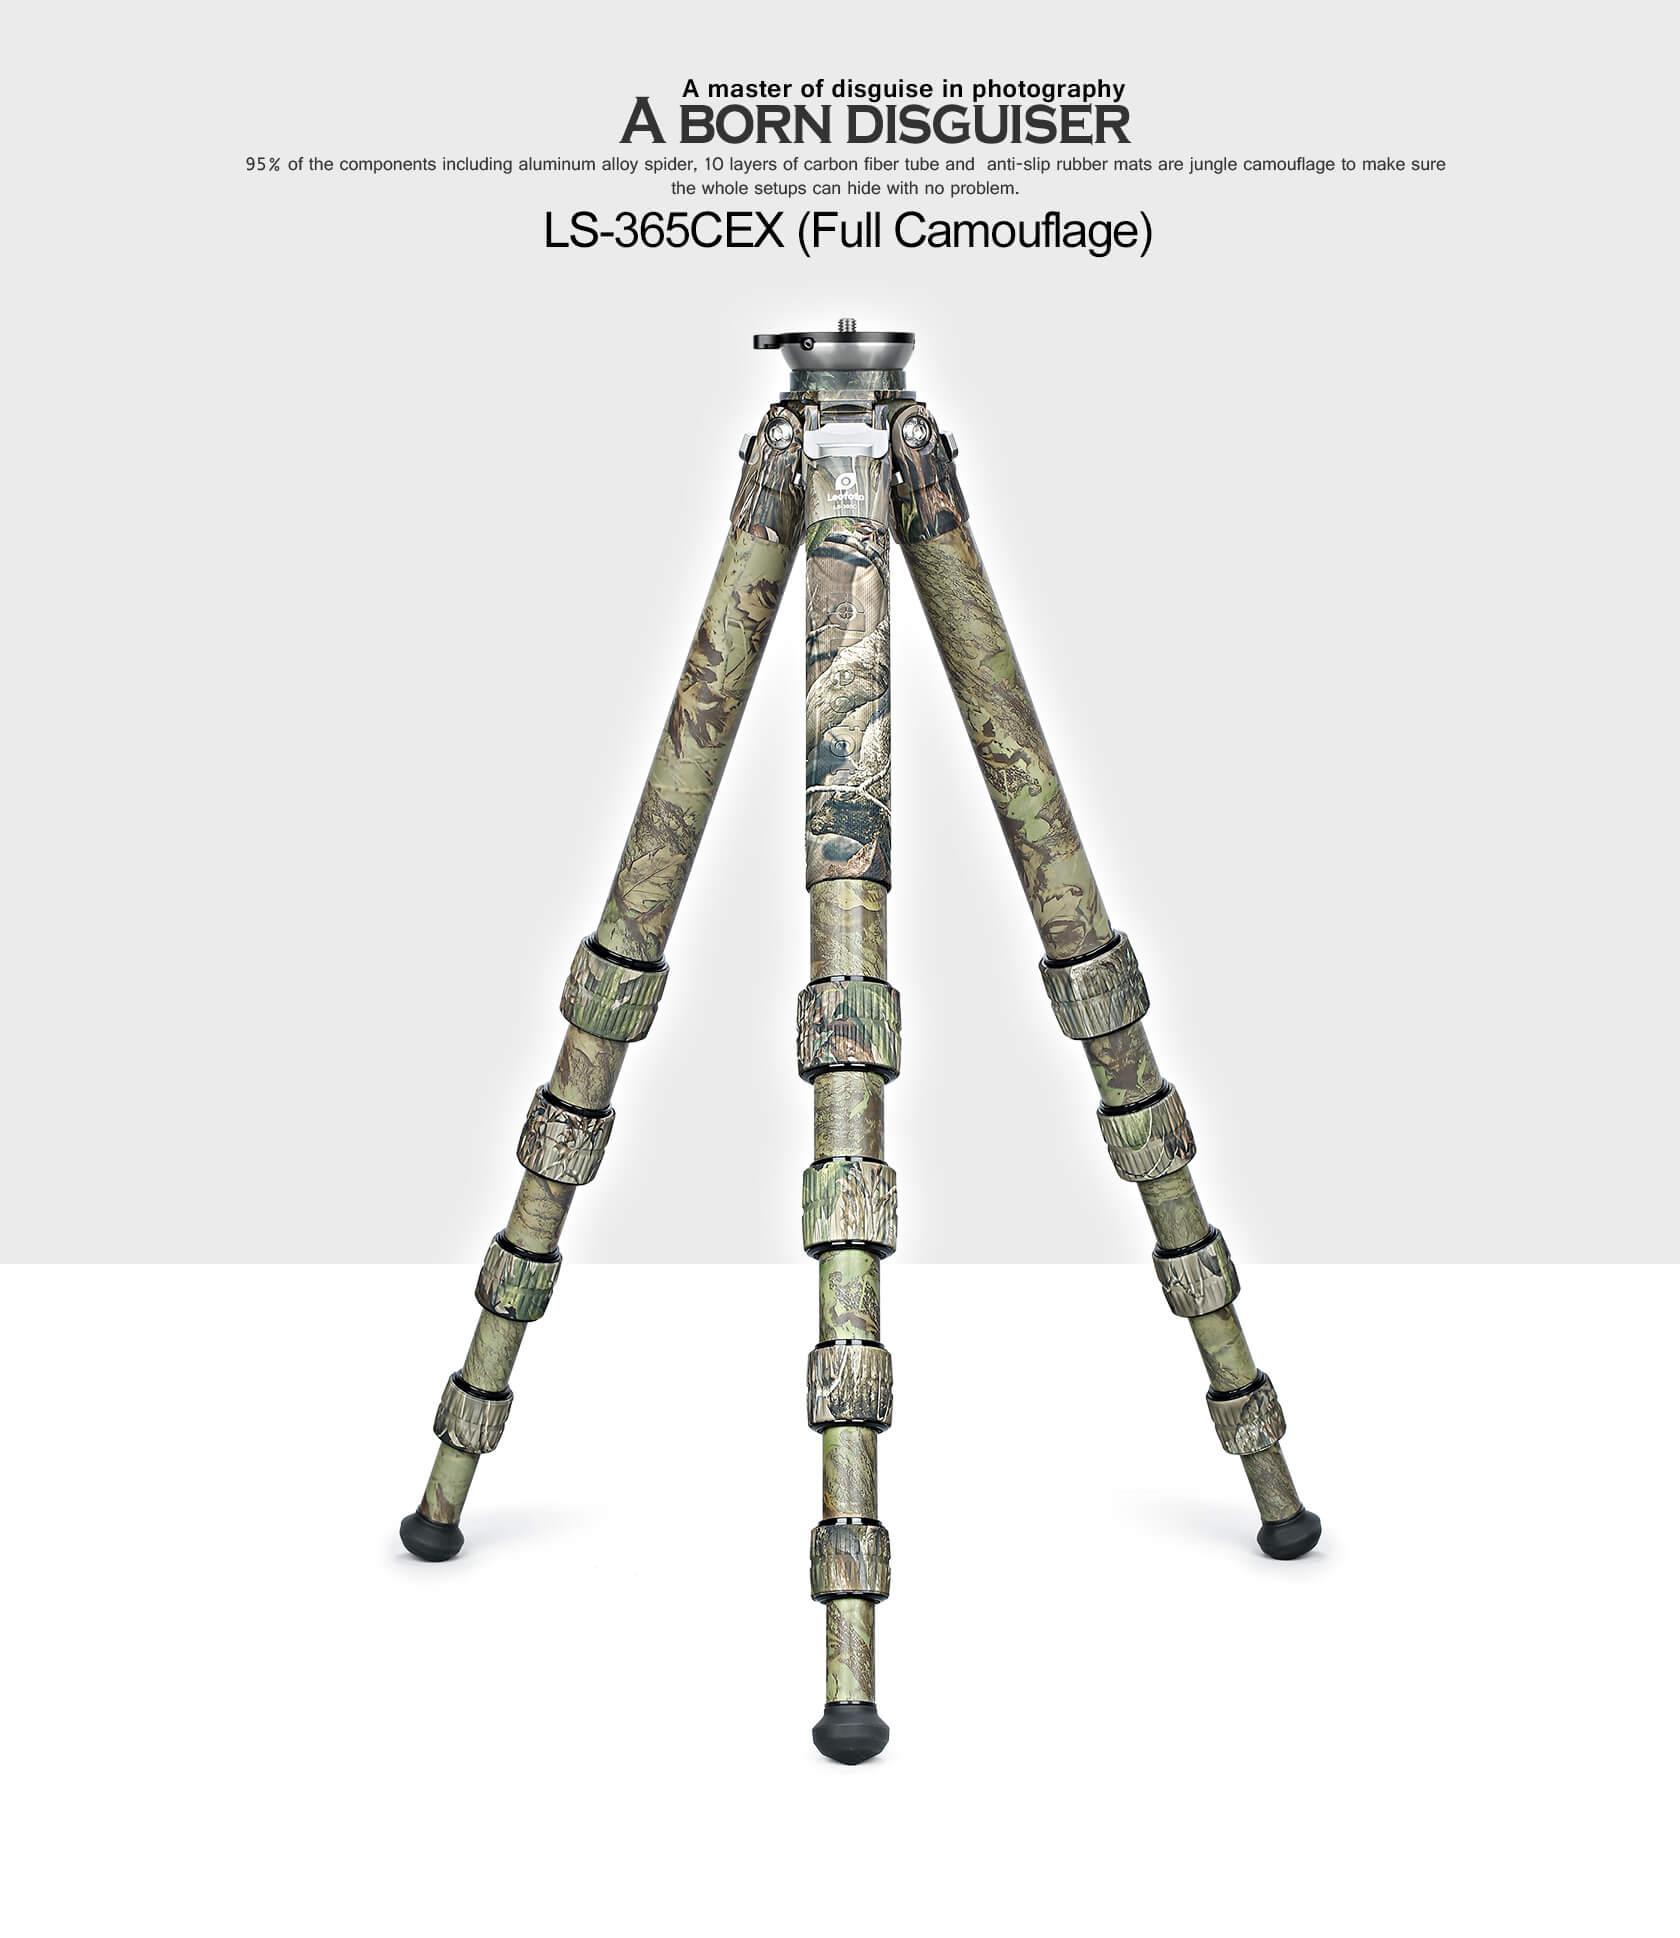 LS-365CEX+PG-1